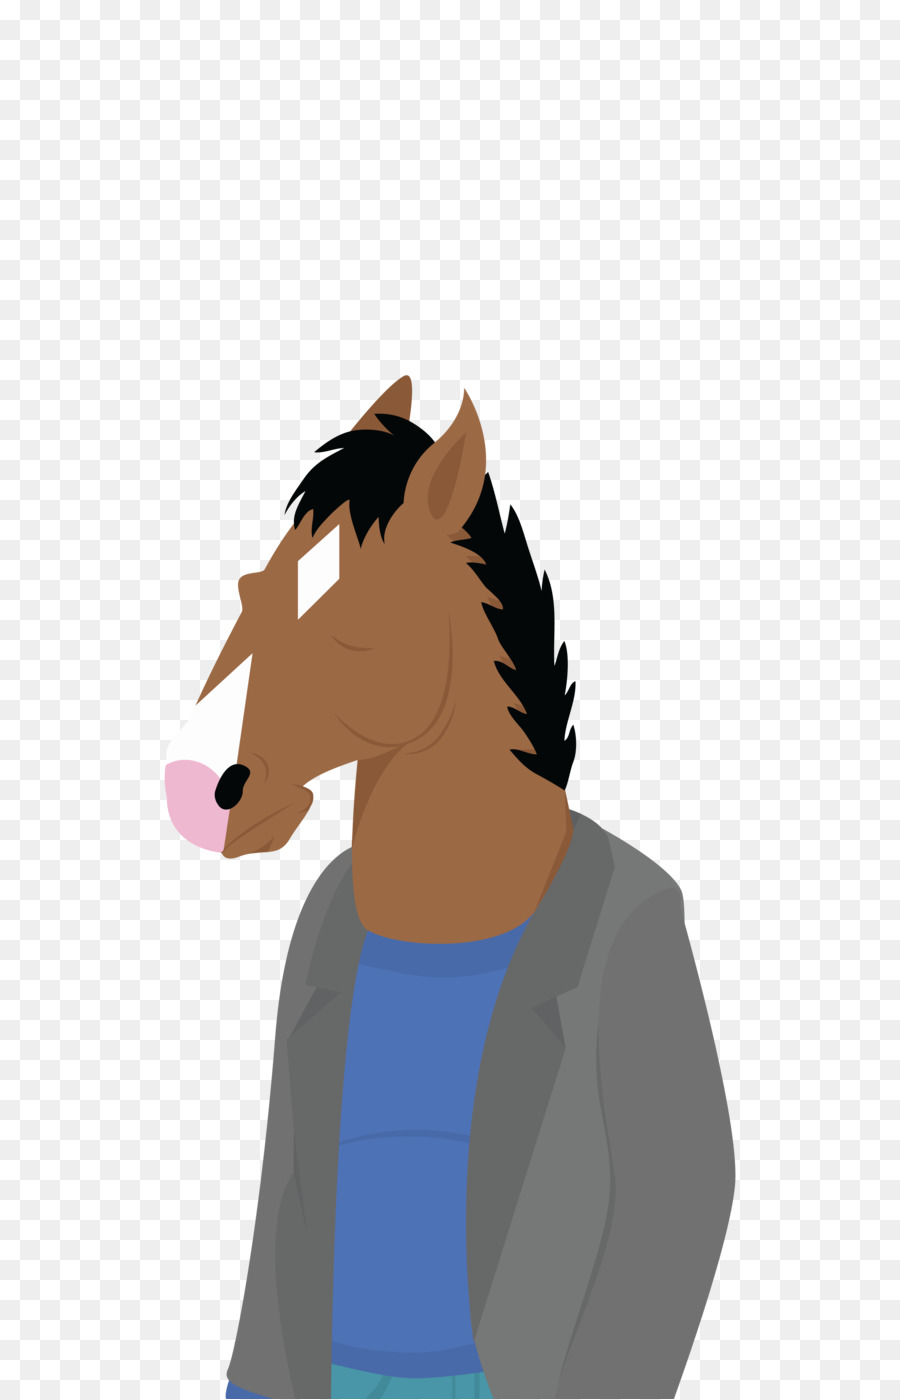 horse netflix pony fan art headless horseman png download 3730 rh kisspng com headless horseman clip art png headless horseman clip art png